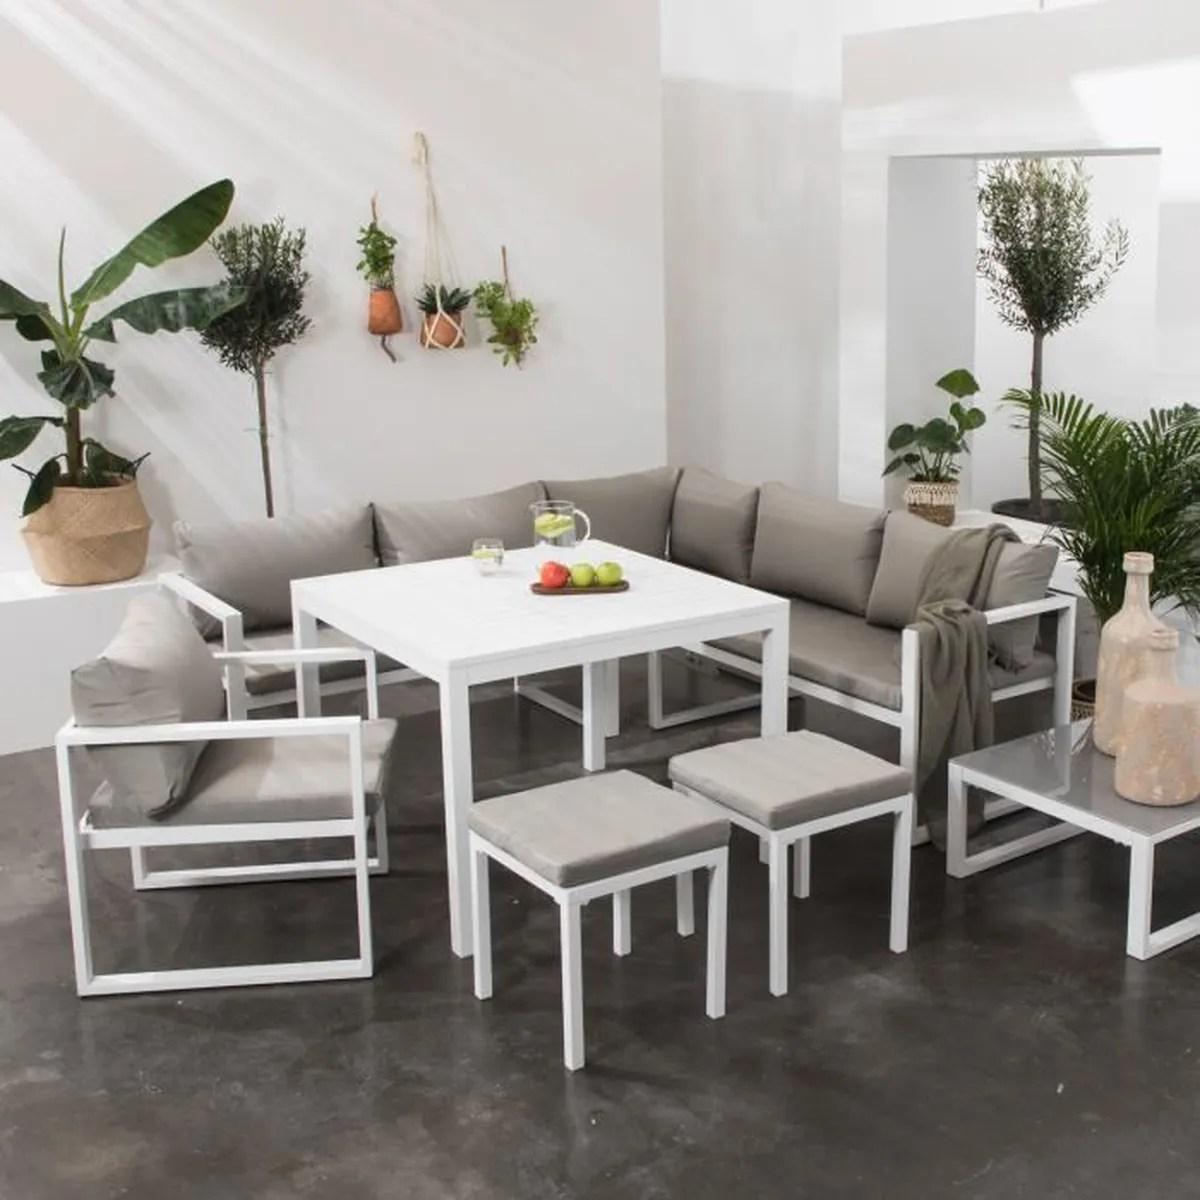 salon de jardin ibiza the best